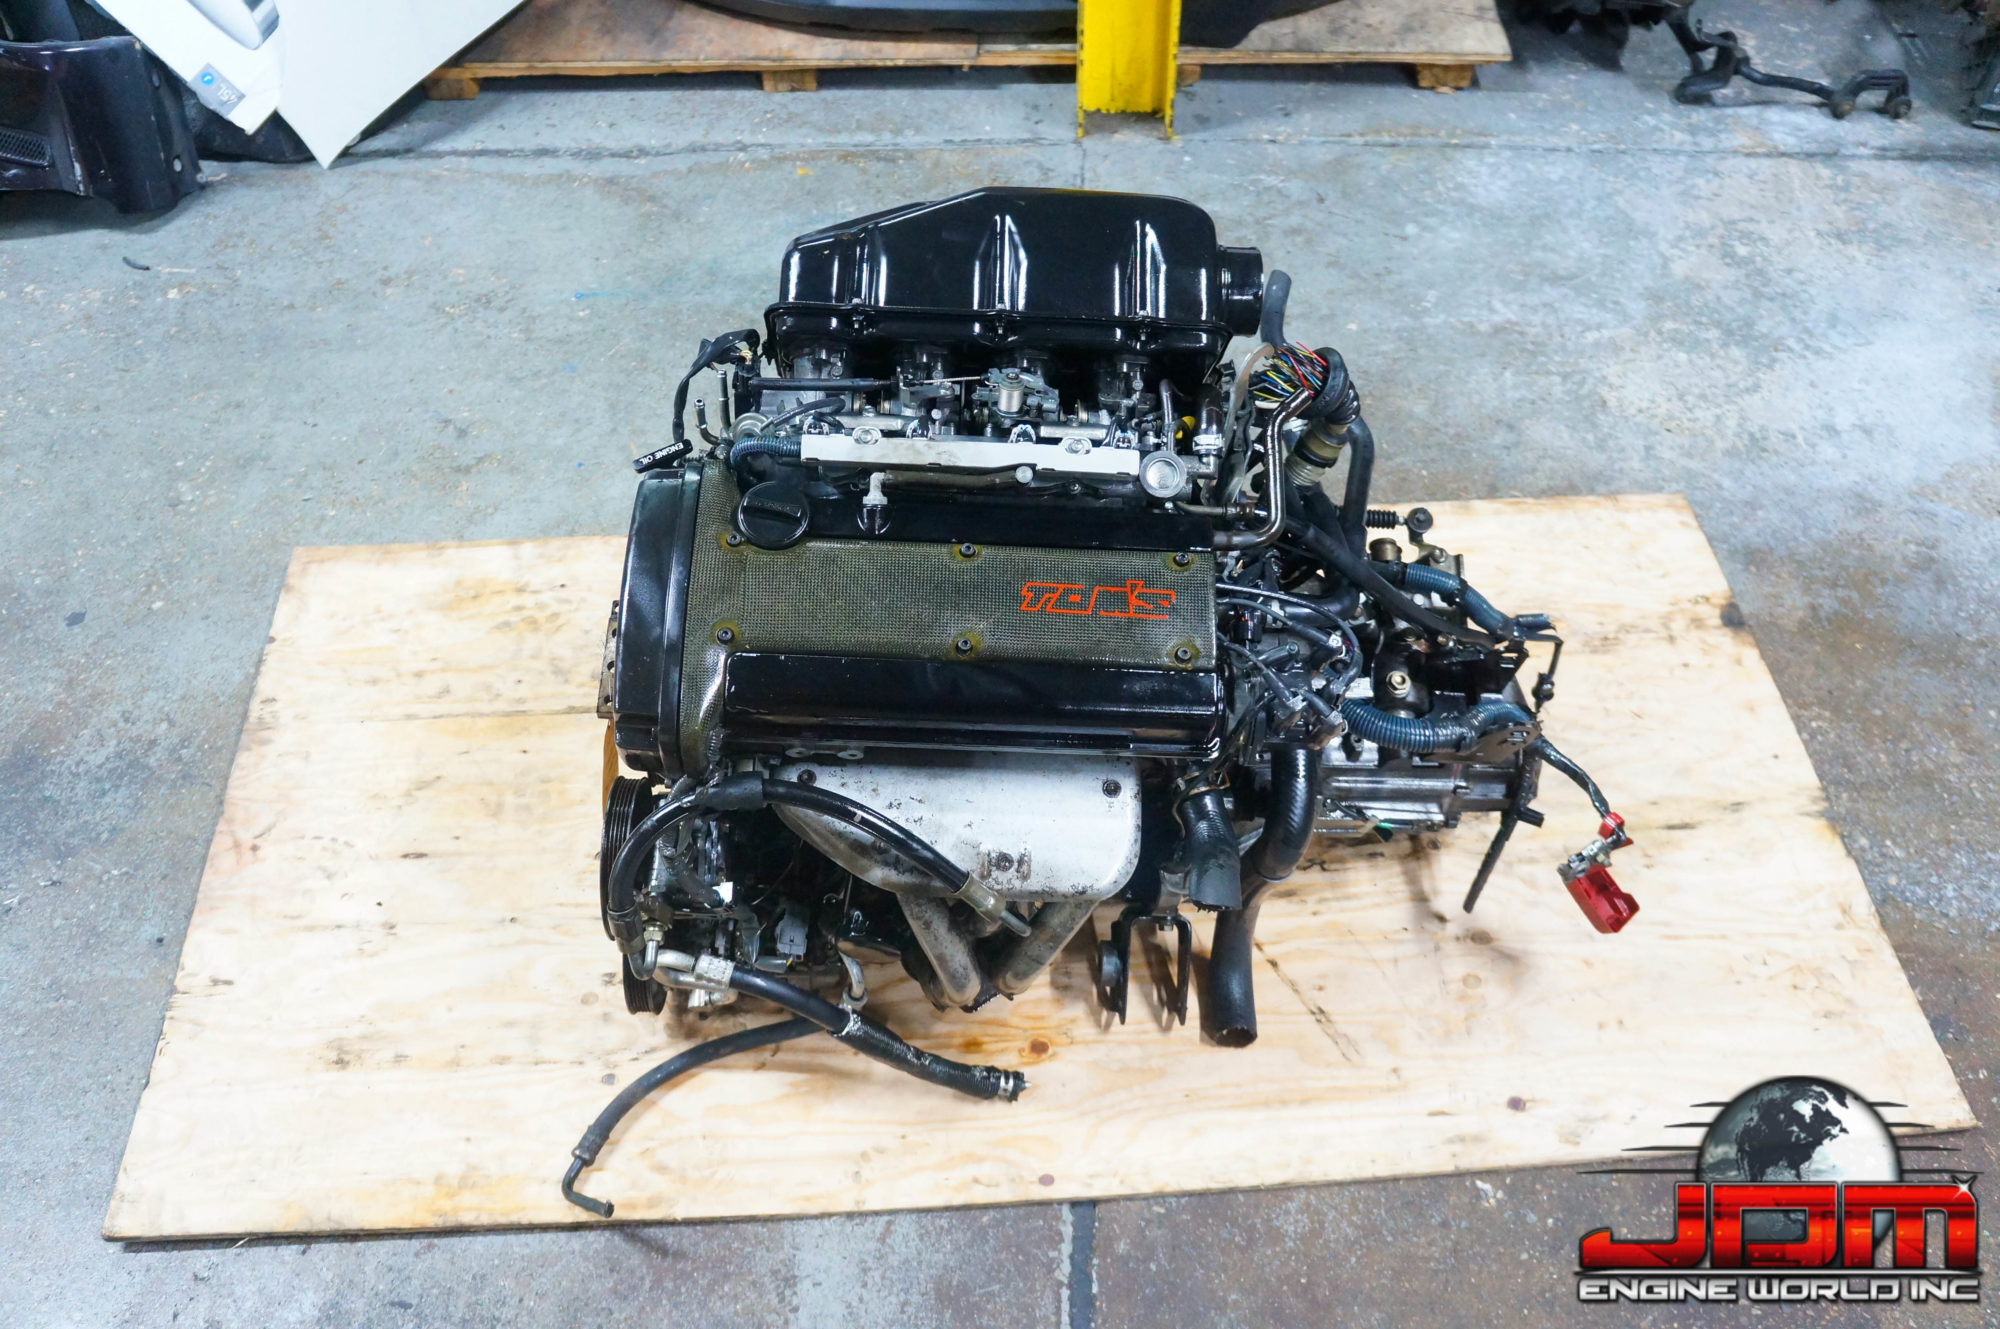 JDM 4A-GE 20VALVE ENGINE WITH MANUAL TRANSMISSION